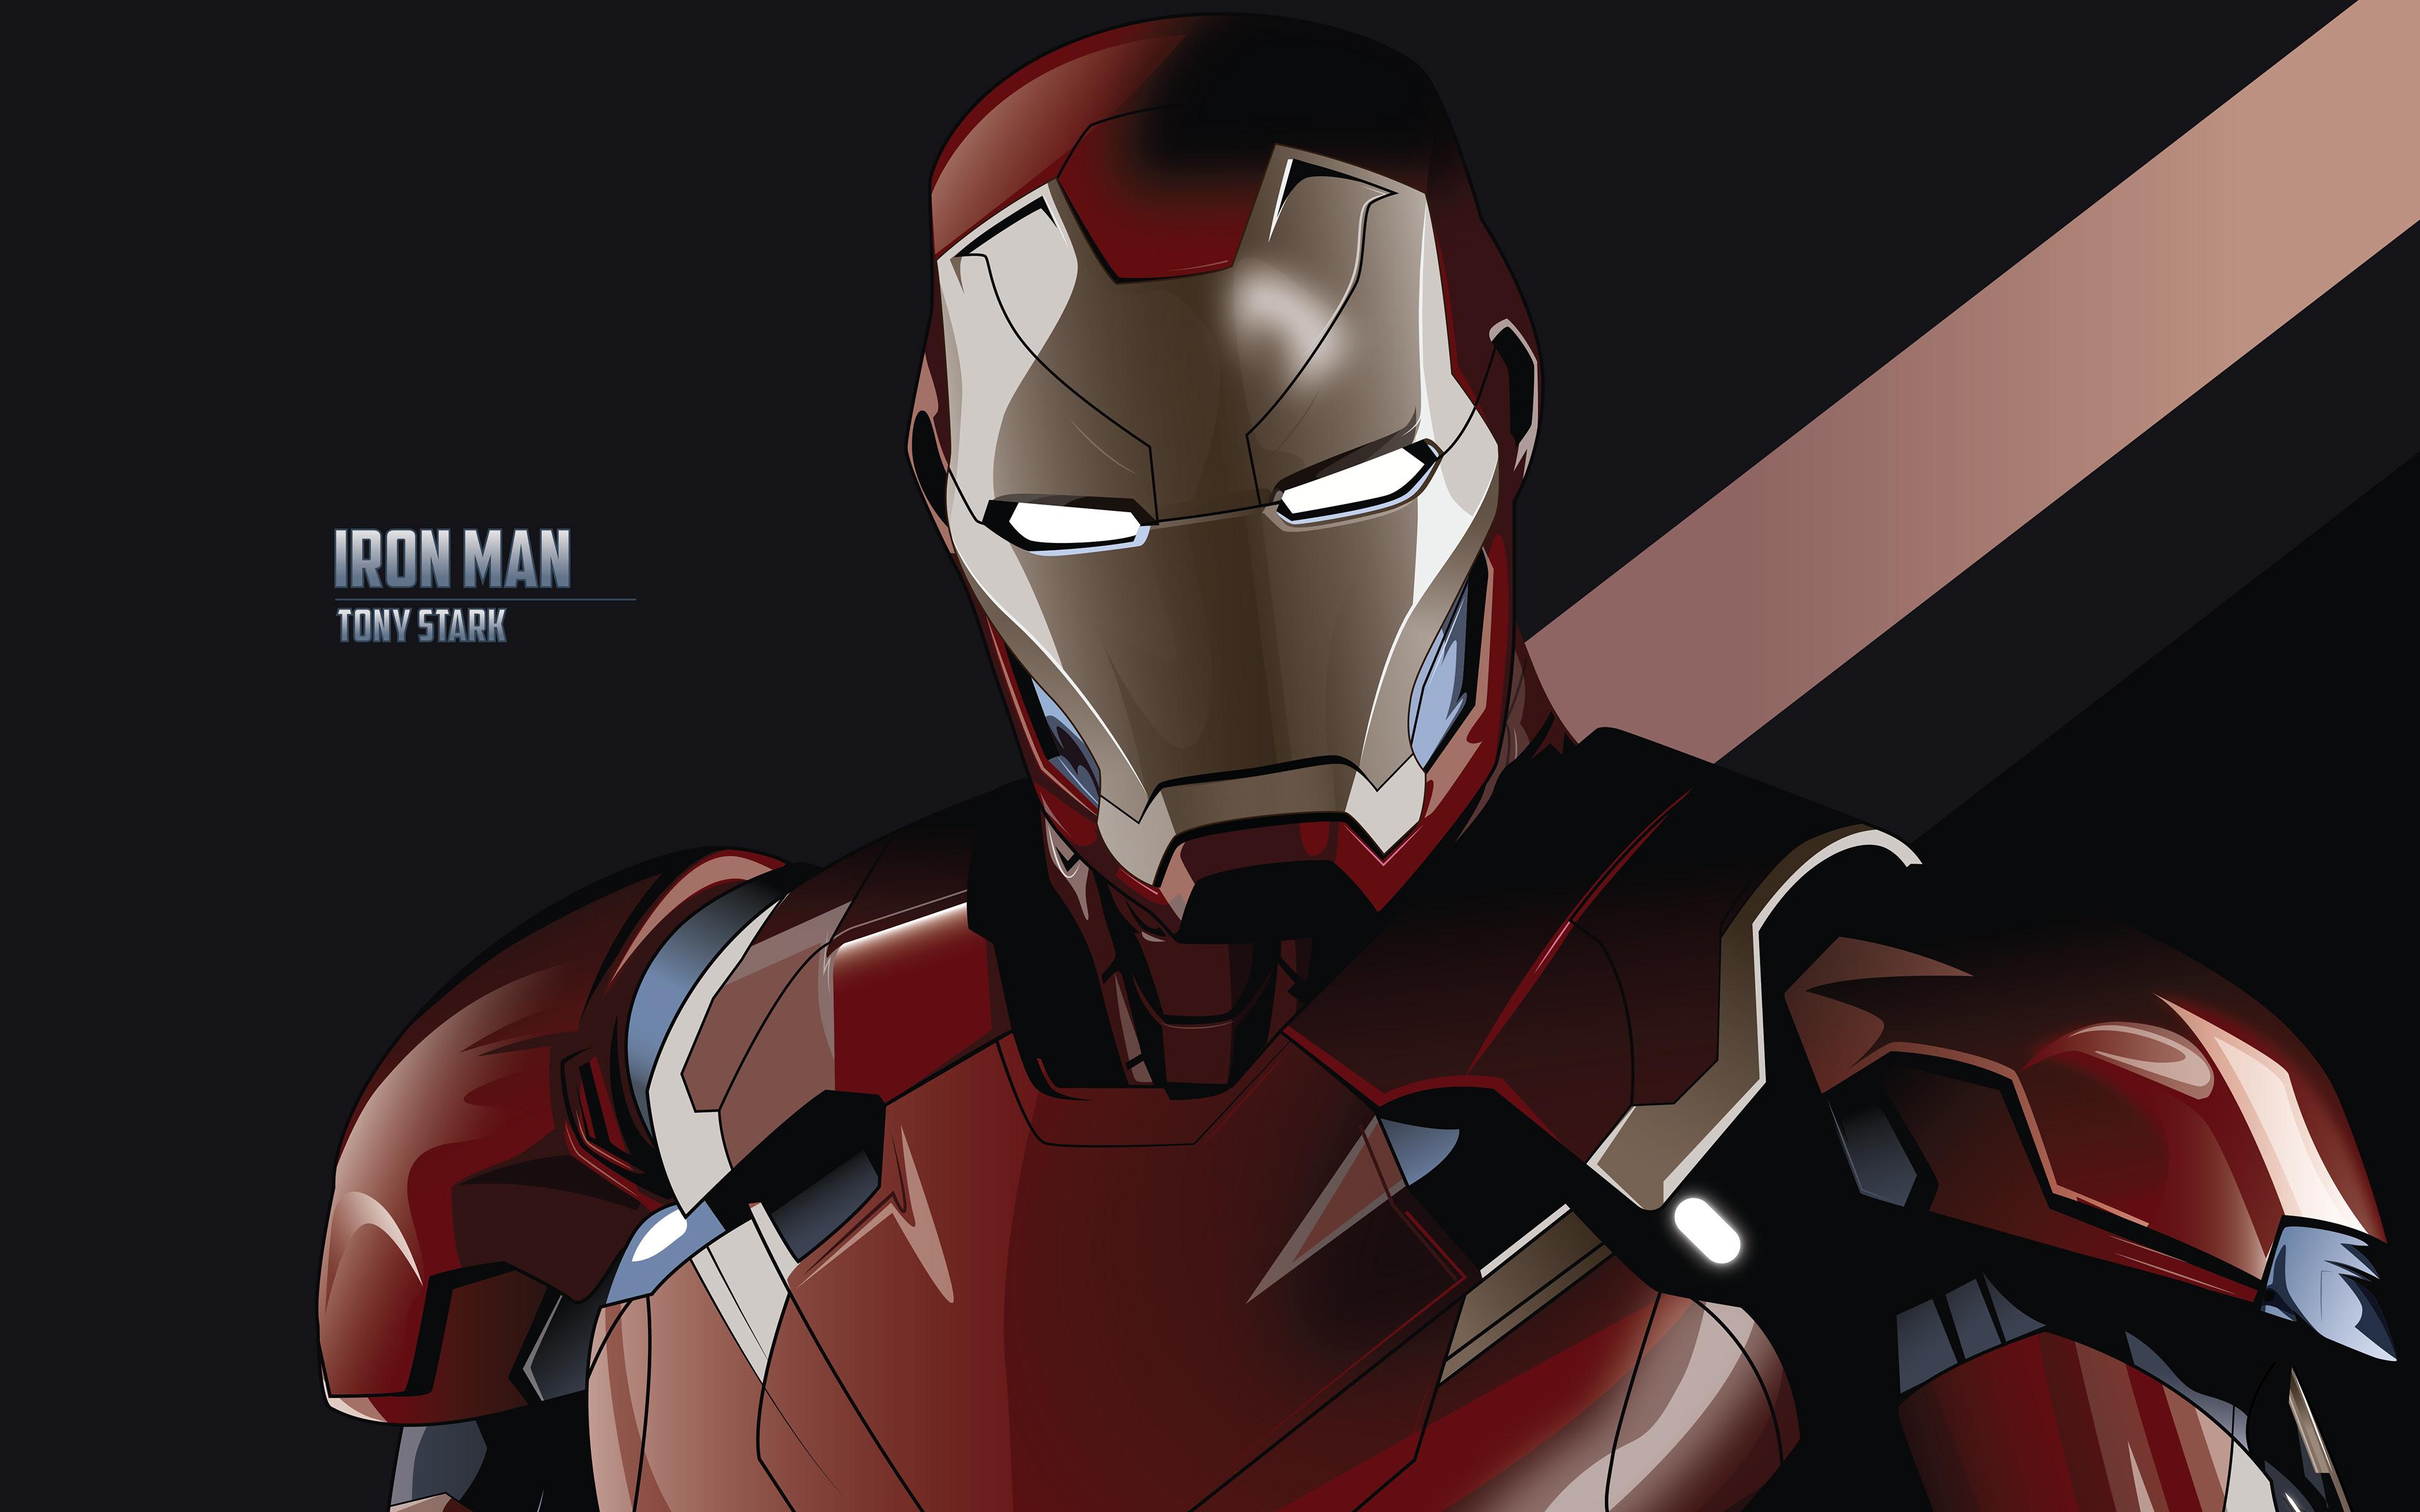 Tony Stark Iron Man Minimal 4k Wallpapers Wallpapers Hd